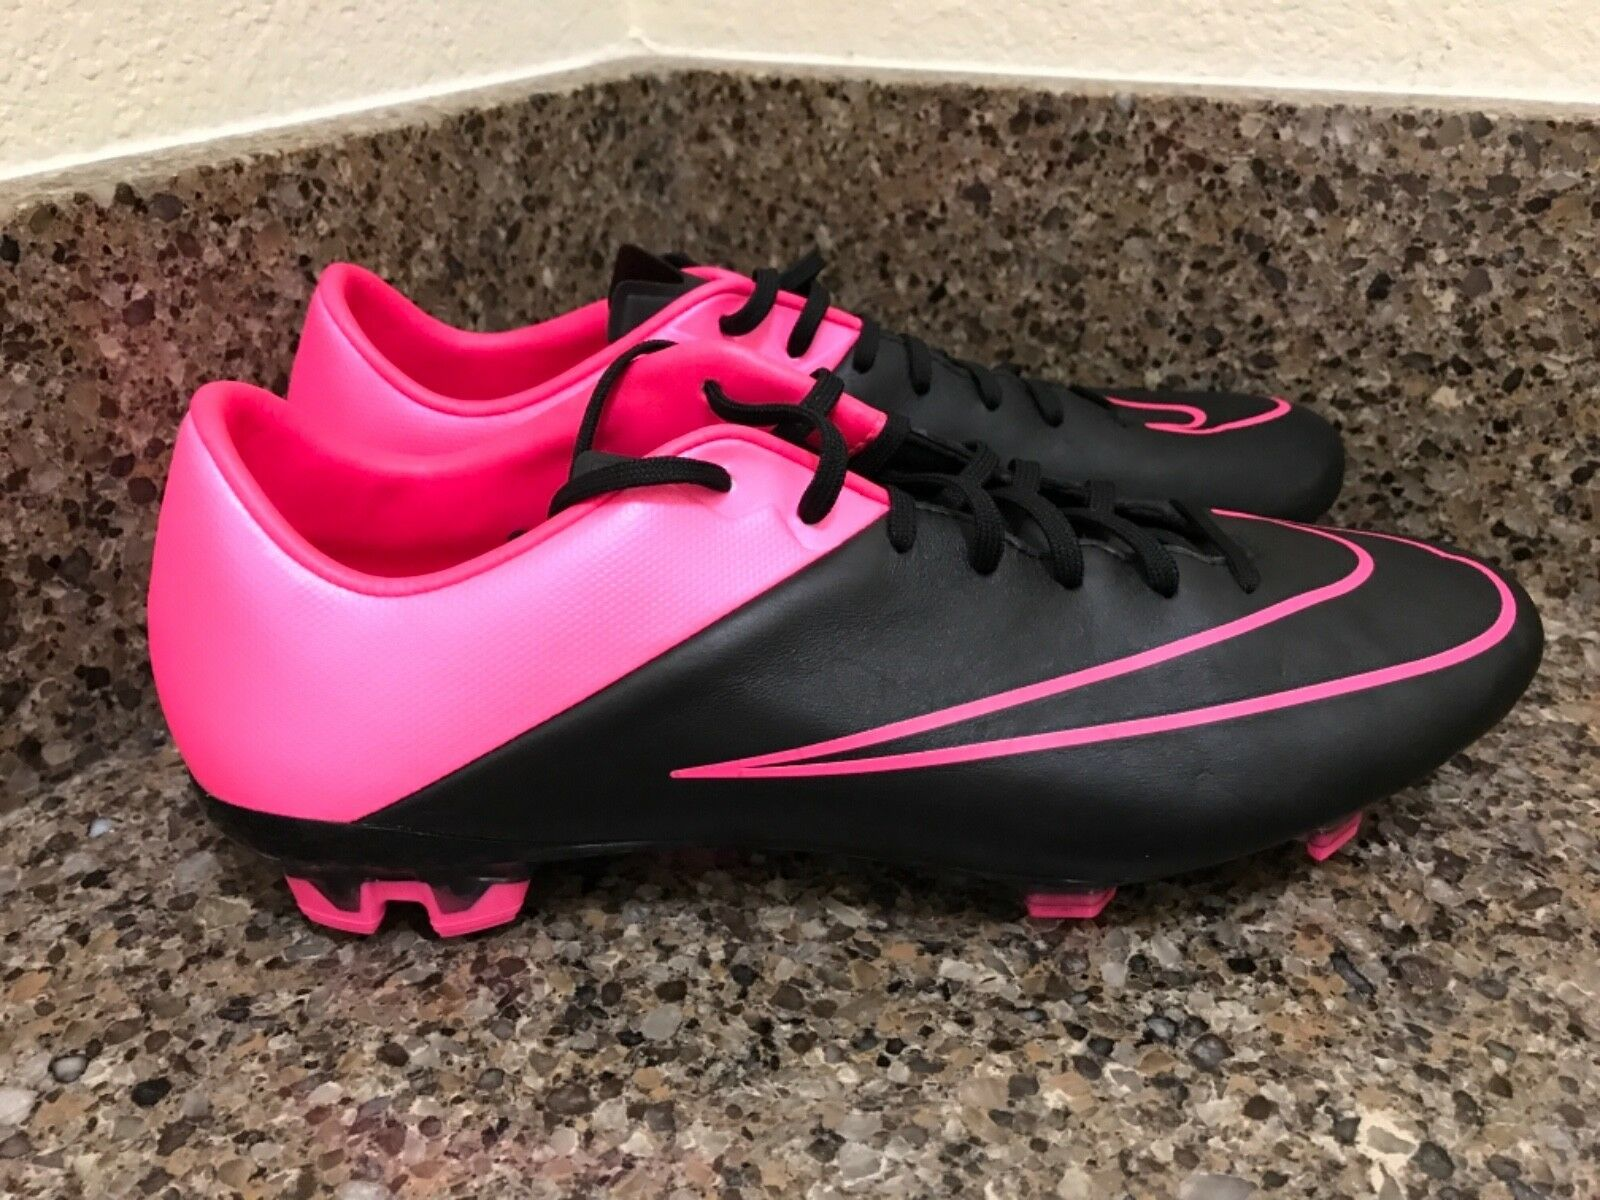 Nike Veloce II FG Men's Soccer Cleats Black/Pink 768808-006 Comfortable